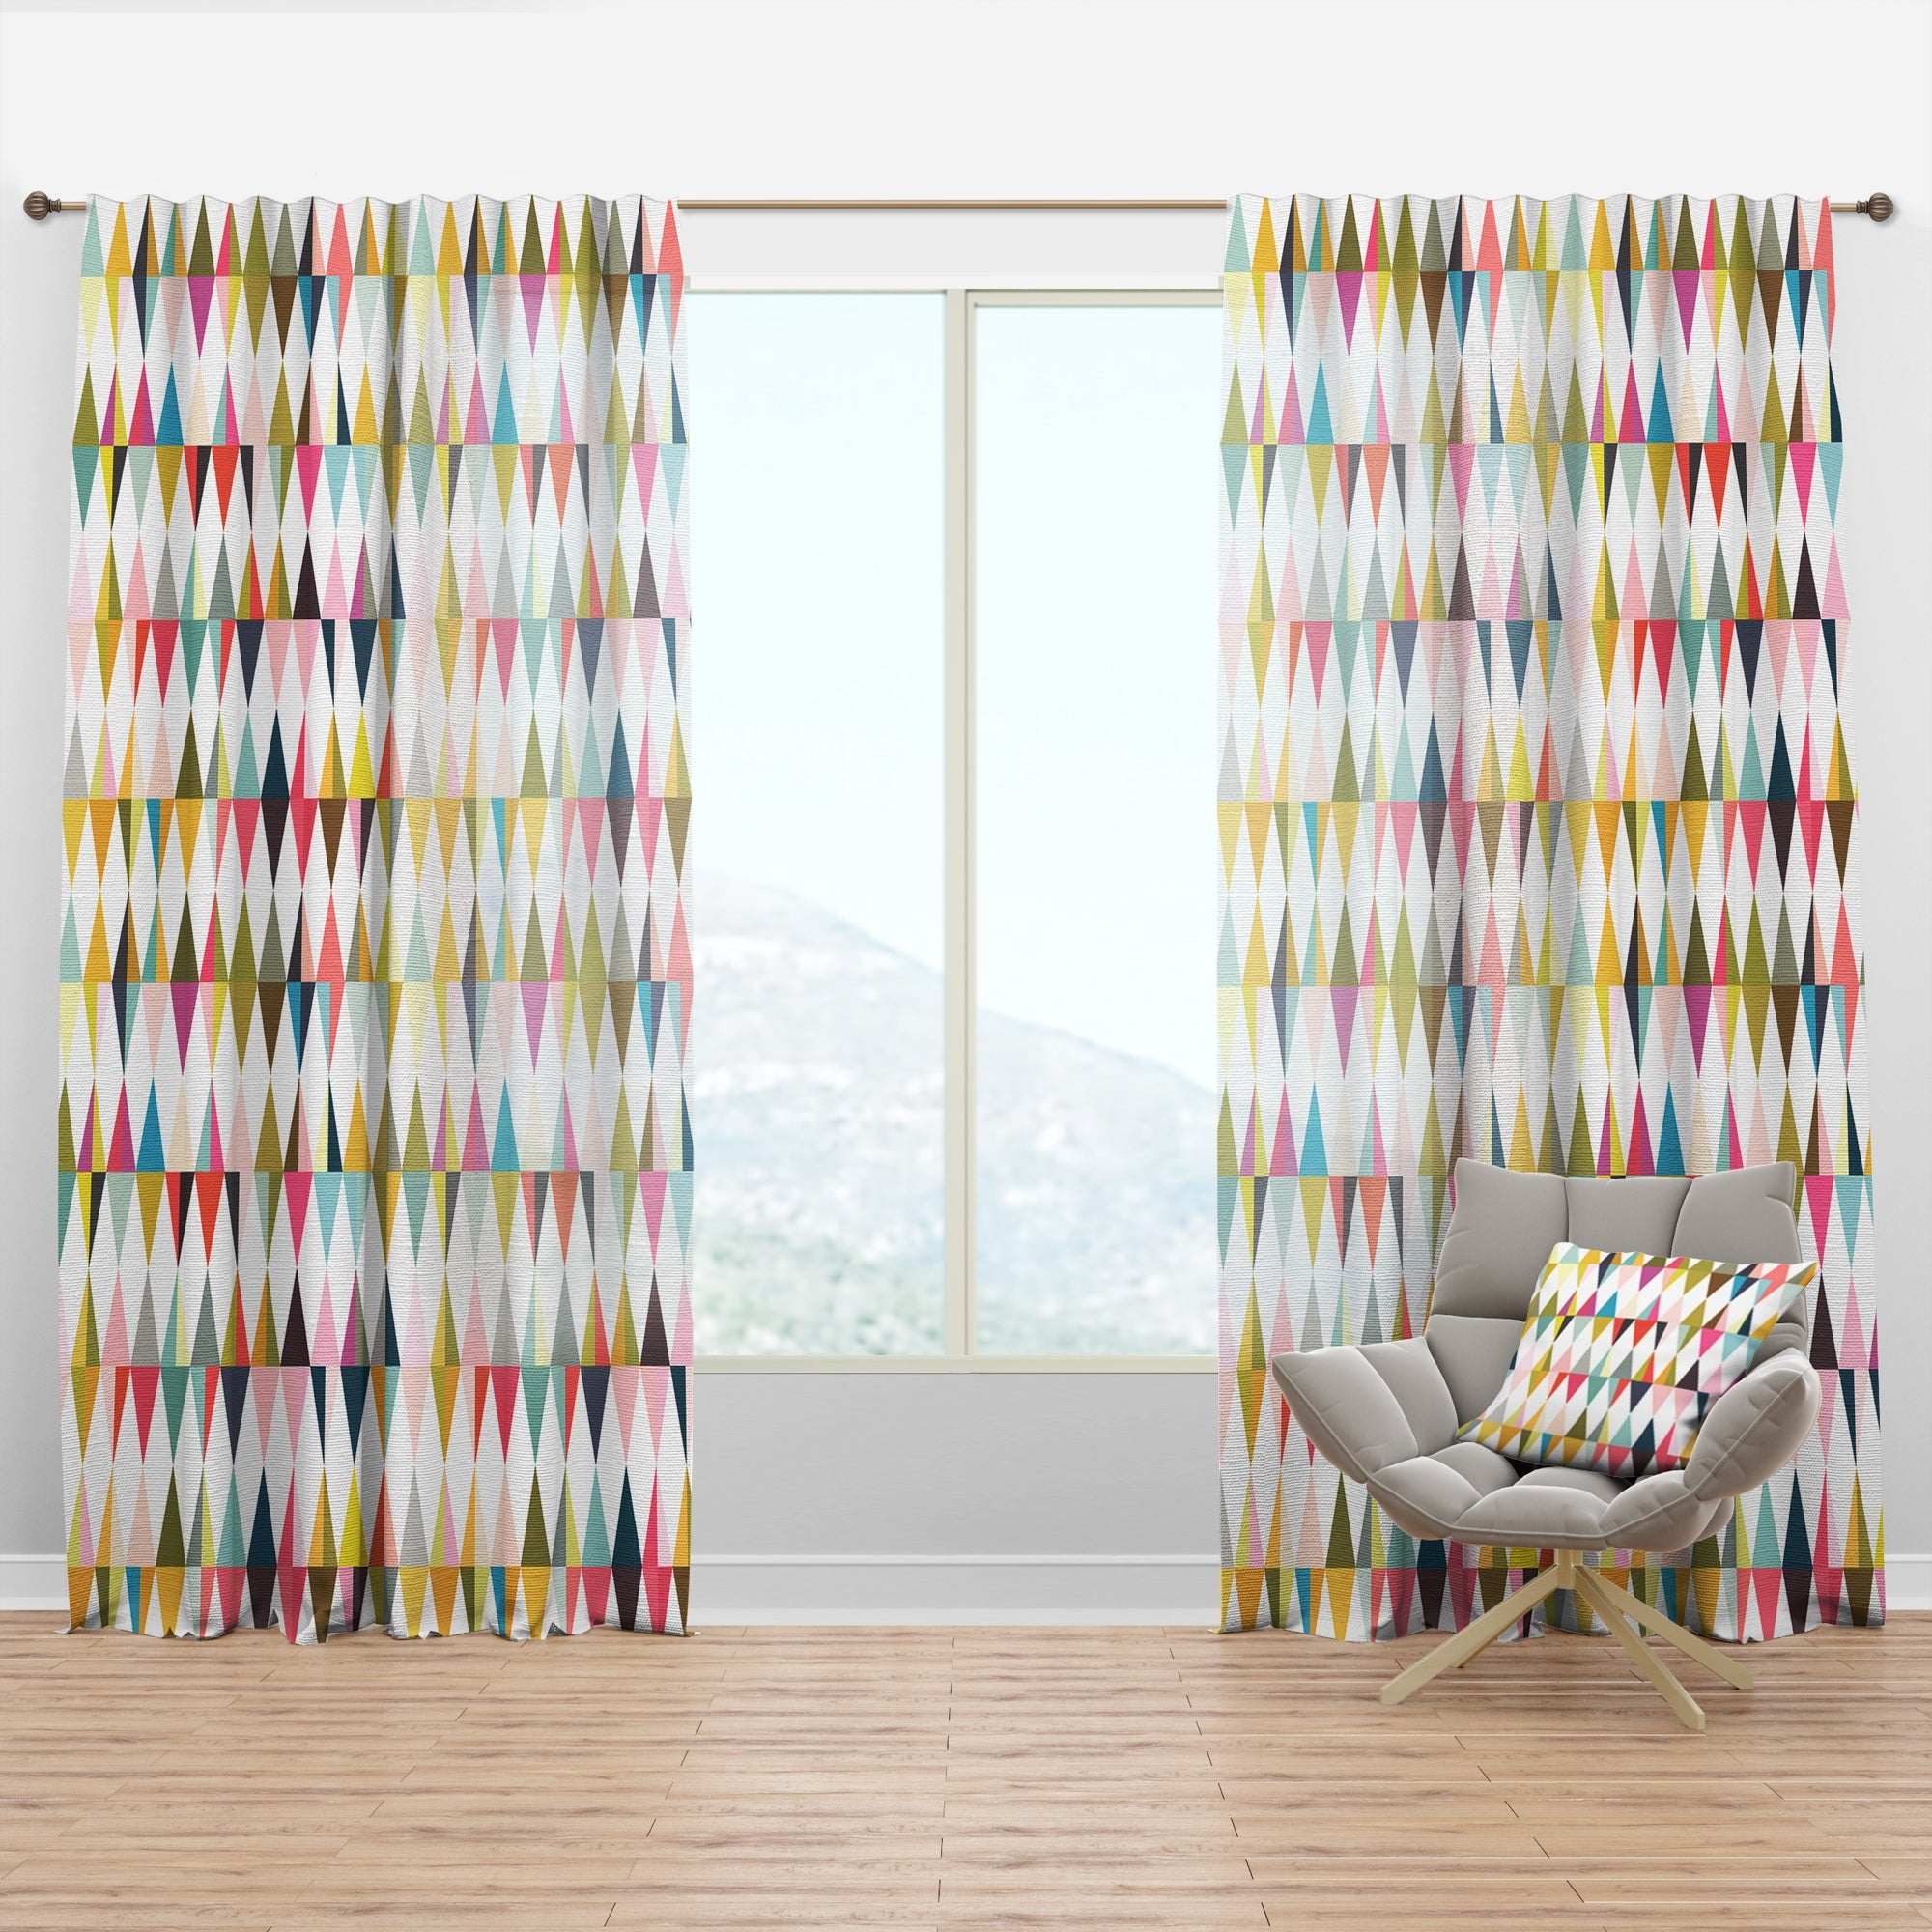 Shop Black Friday Deals On Designart Diamond Retro Vii Mid Century Modern Curtain Panel Overstock 29626133